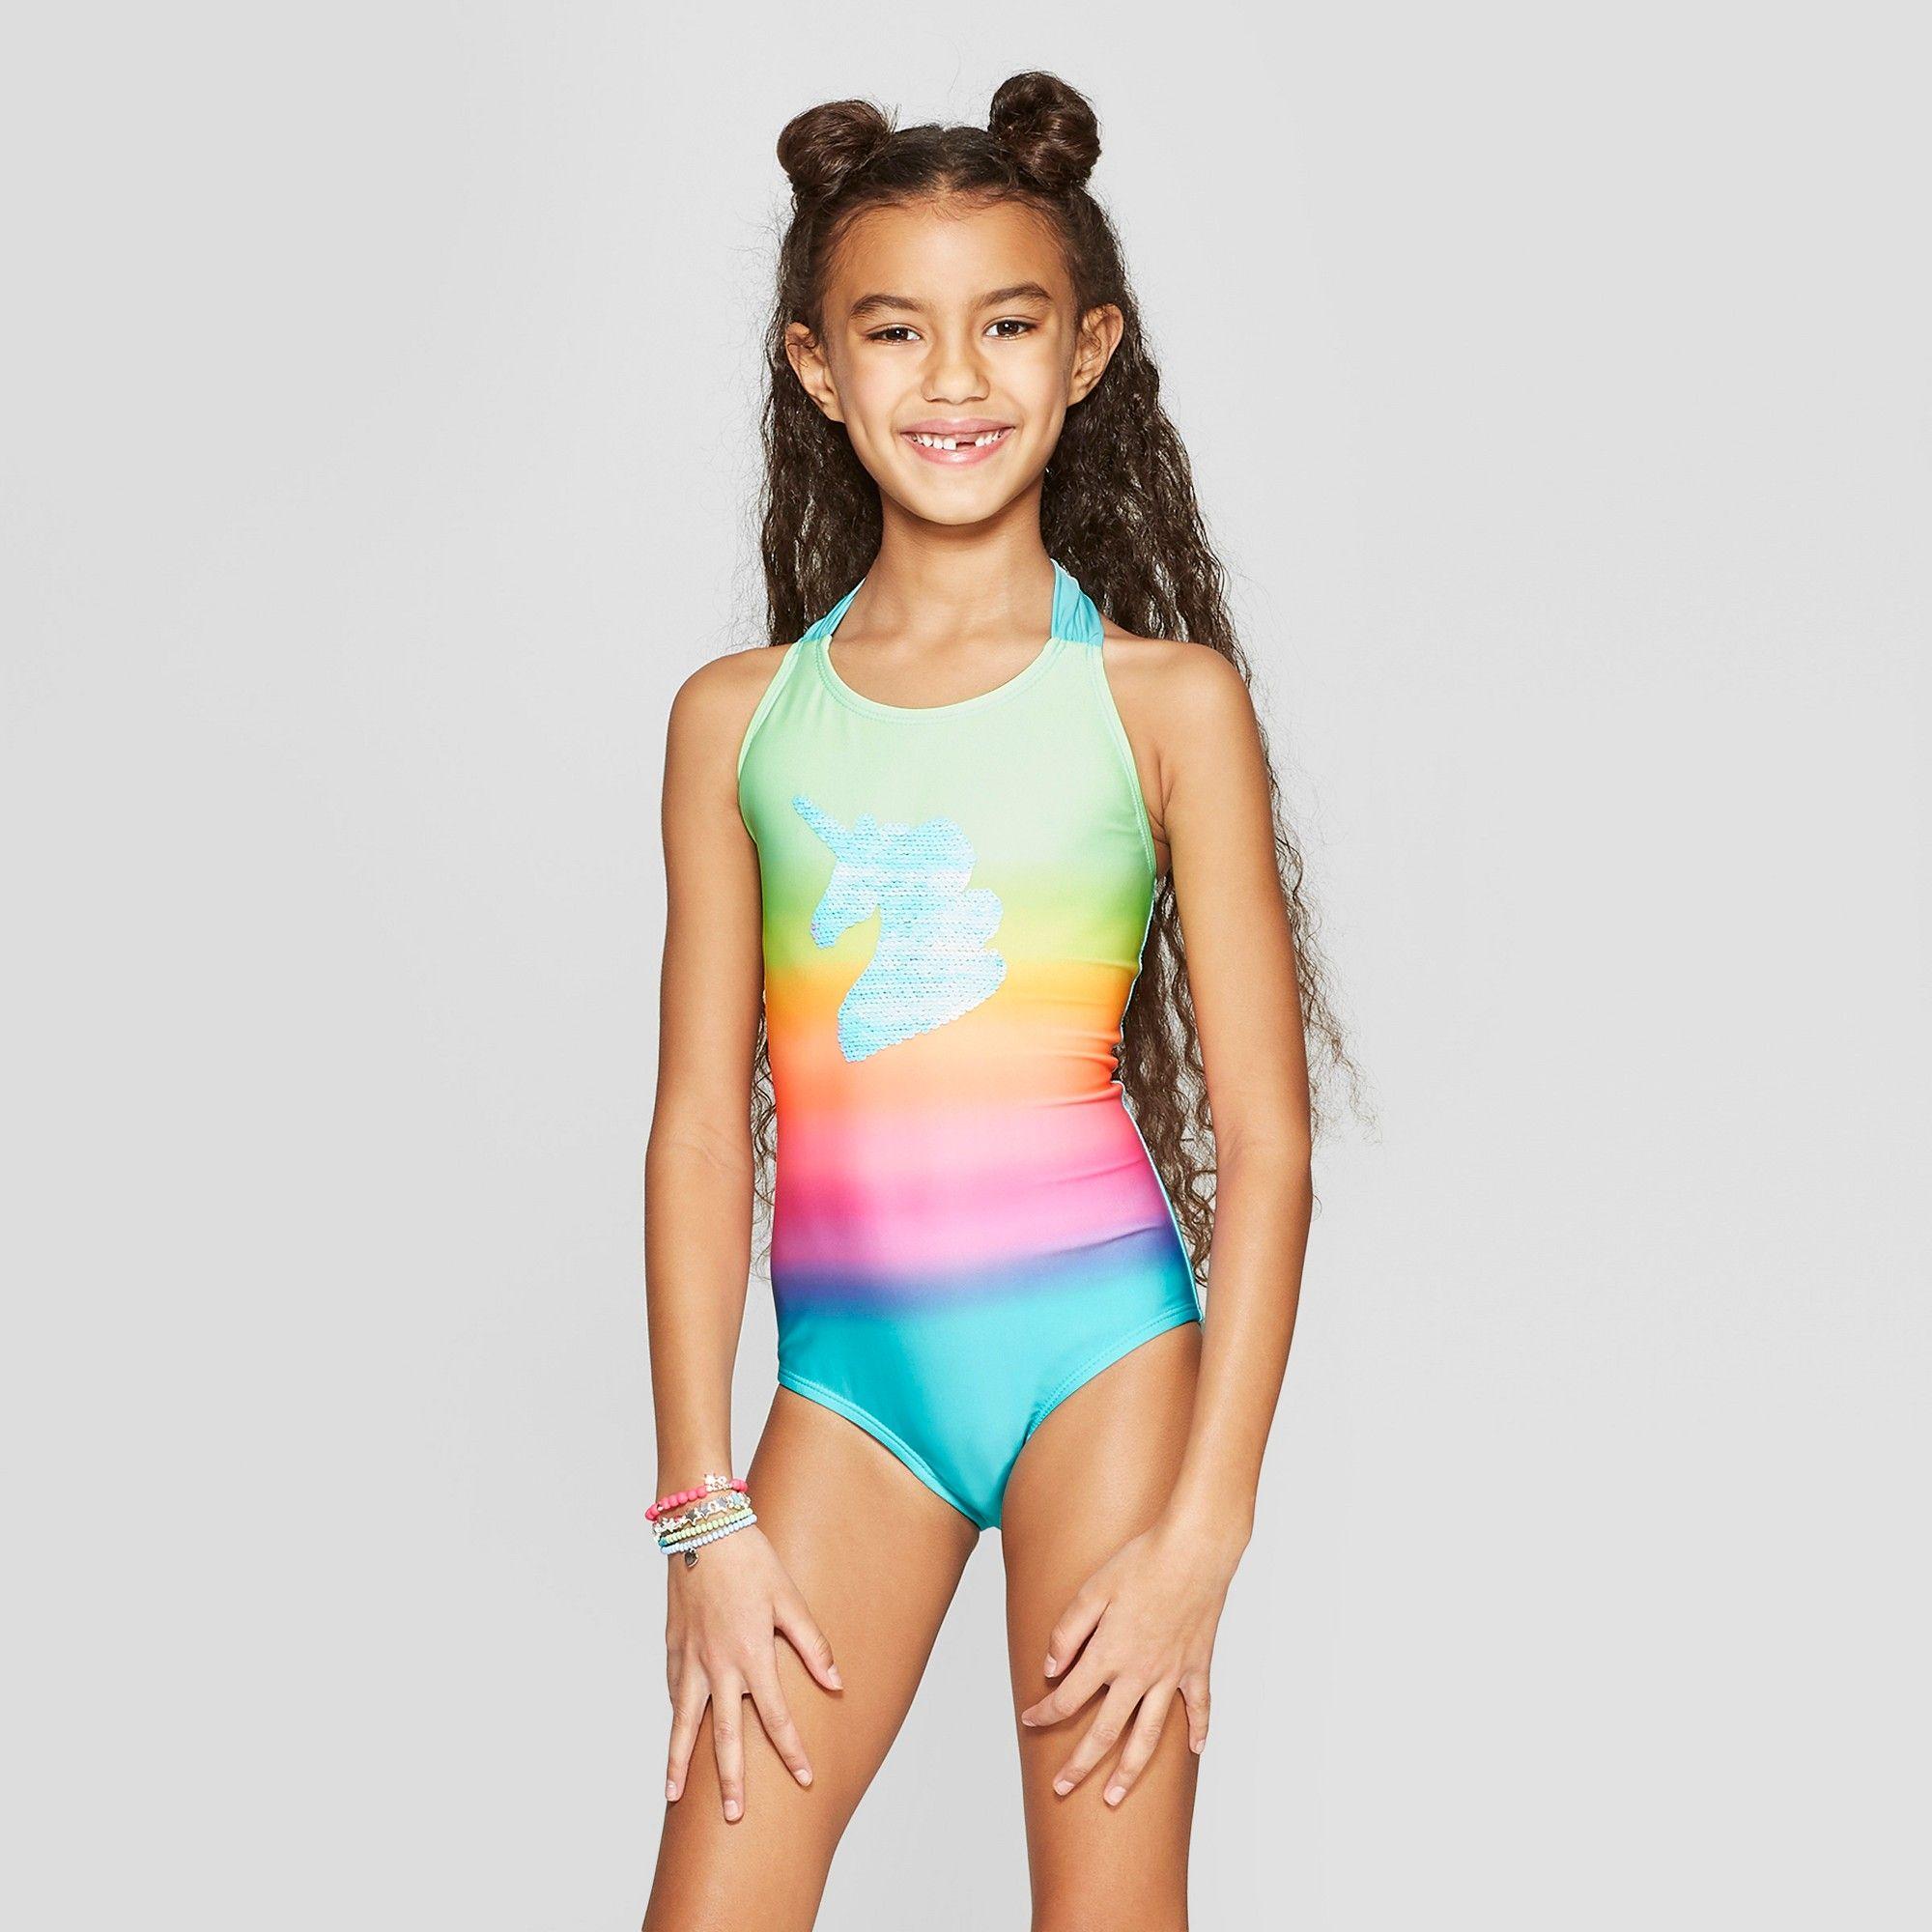 daa2d6548d6 Plus Size Girls' Flip Sequins Time to Shine One Piece Swimsuit - Cat & Jack  M Plus, Multicolored